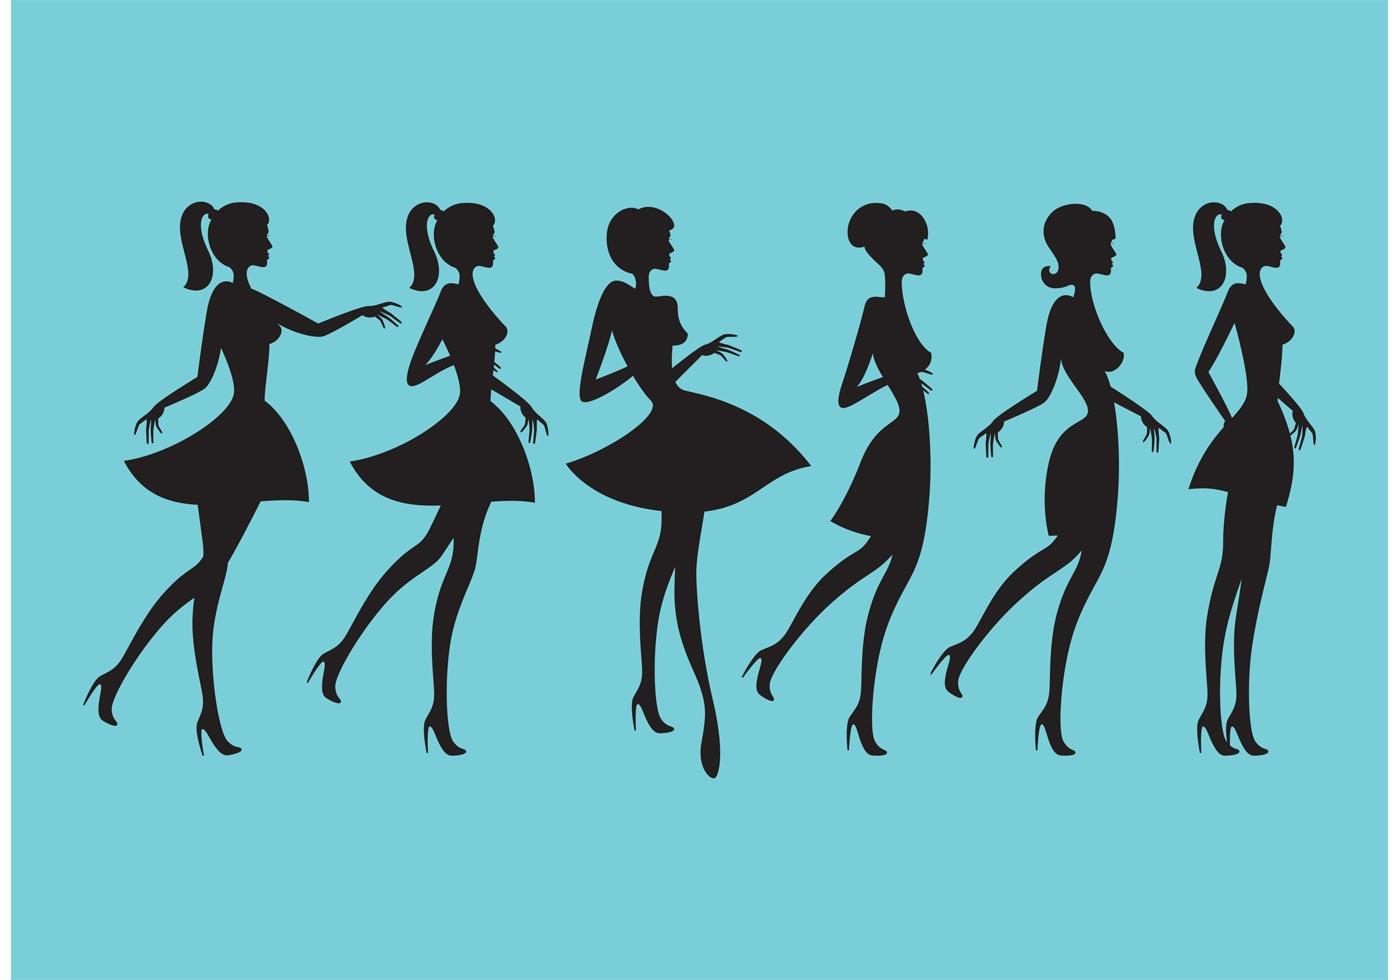 Schöne Frauen Koerper Skizze Silhouetten Weibliche